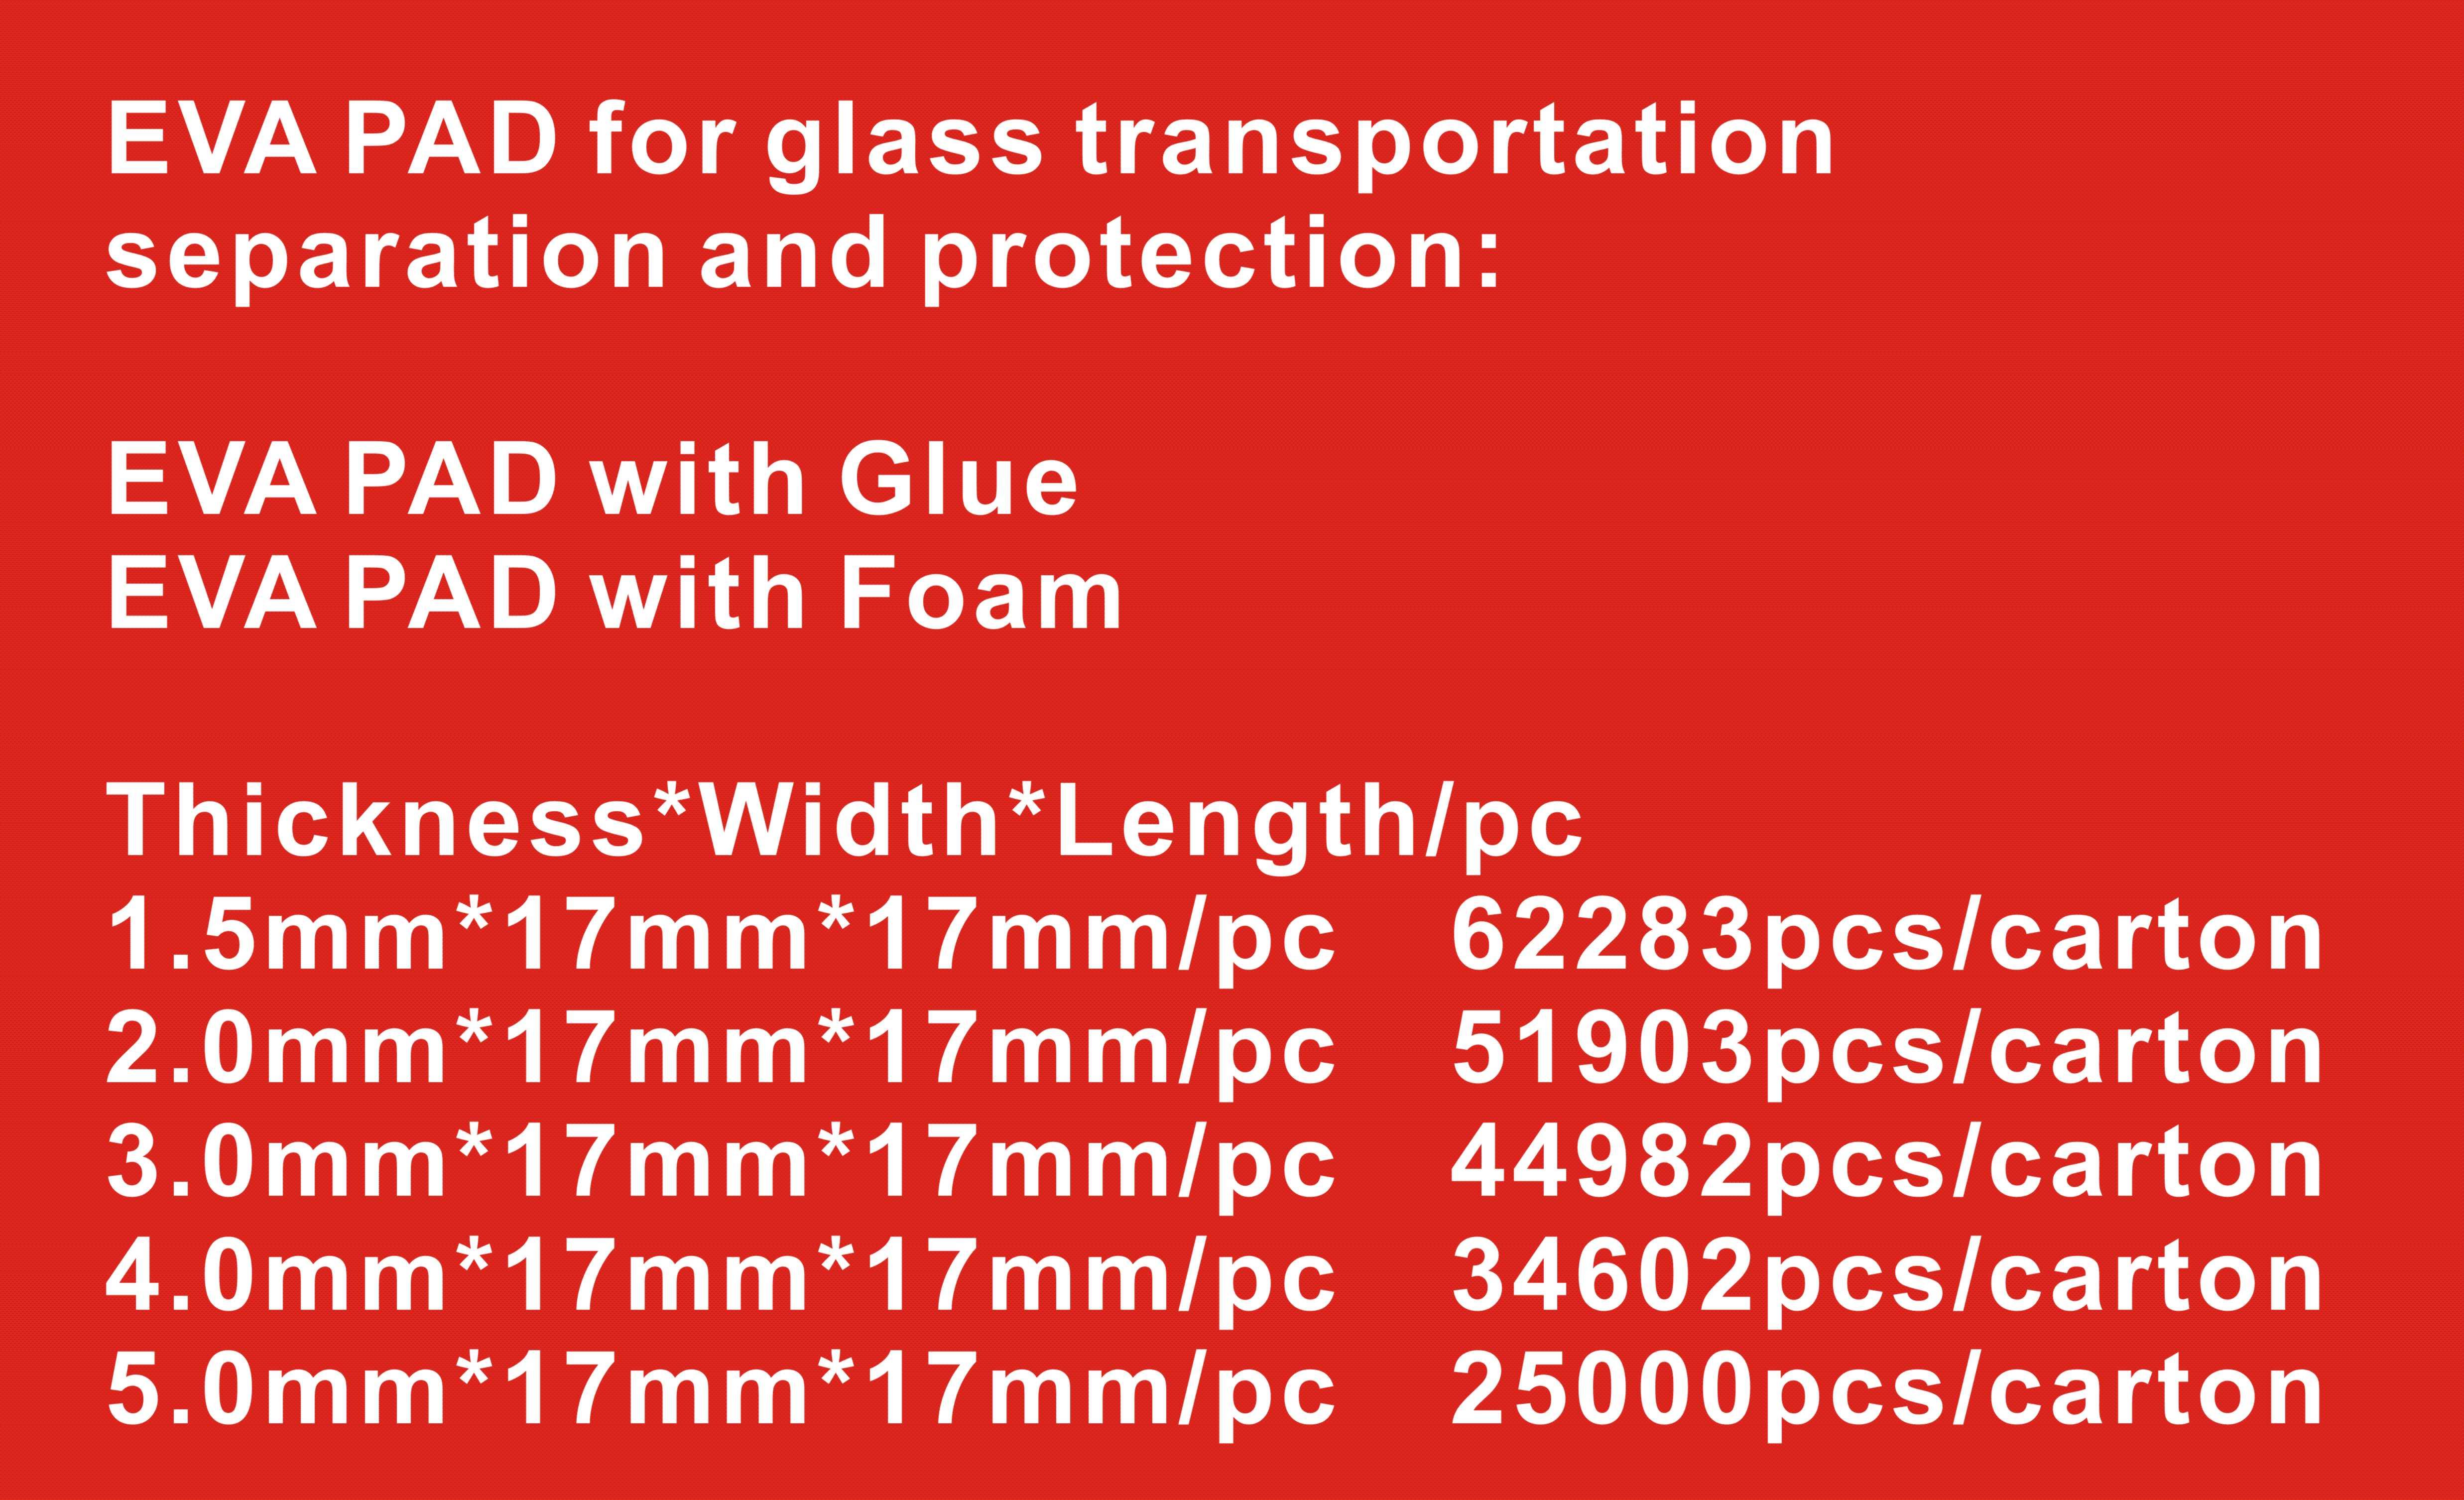 EVA PAD for glass transportation separation protection (2)